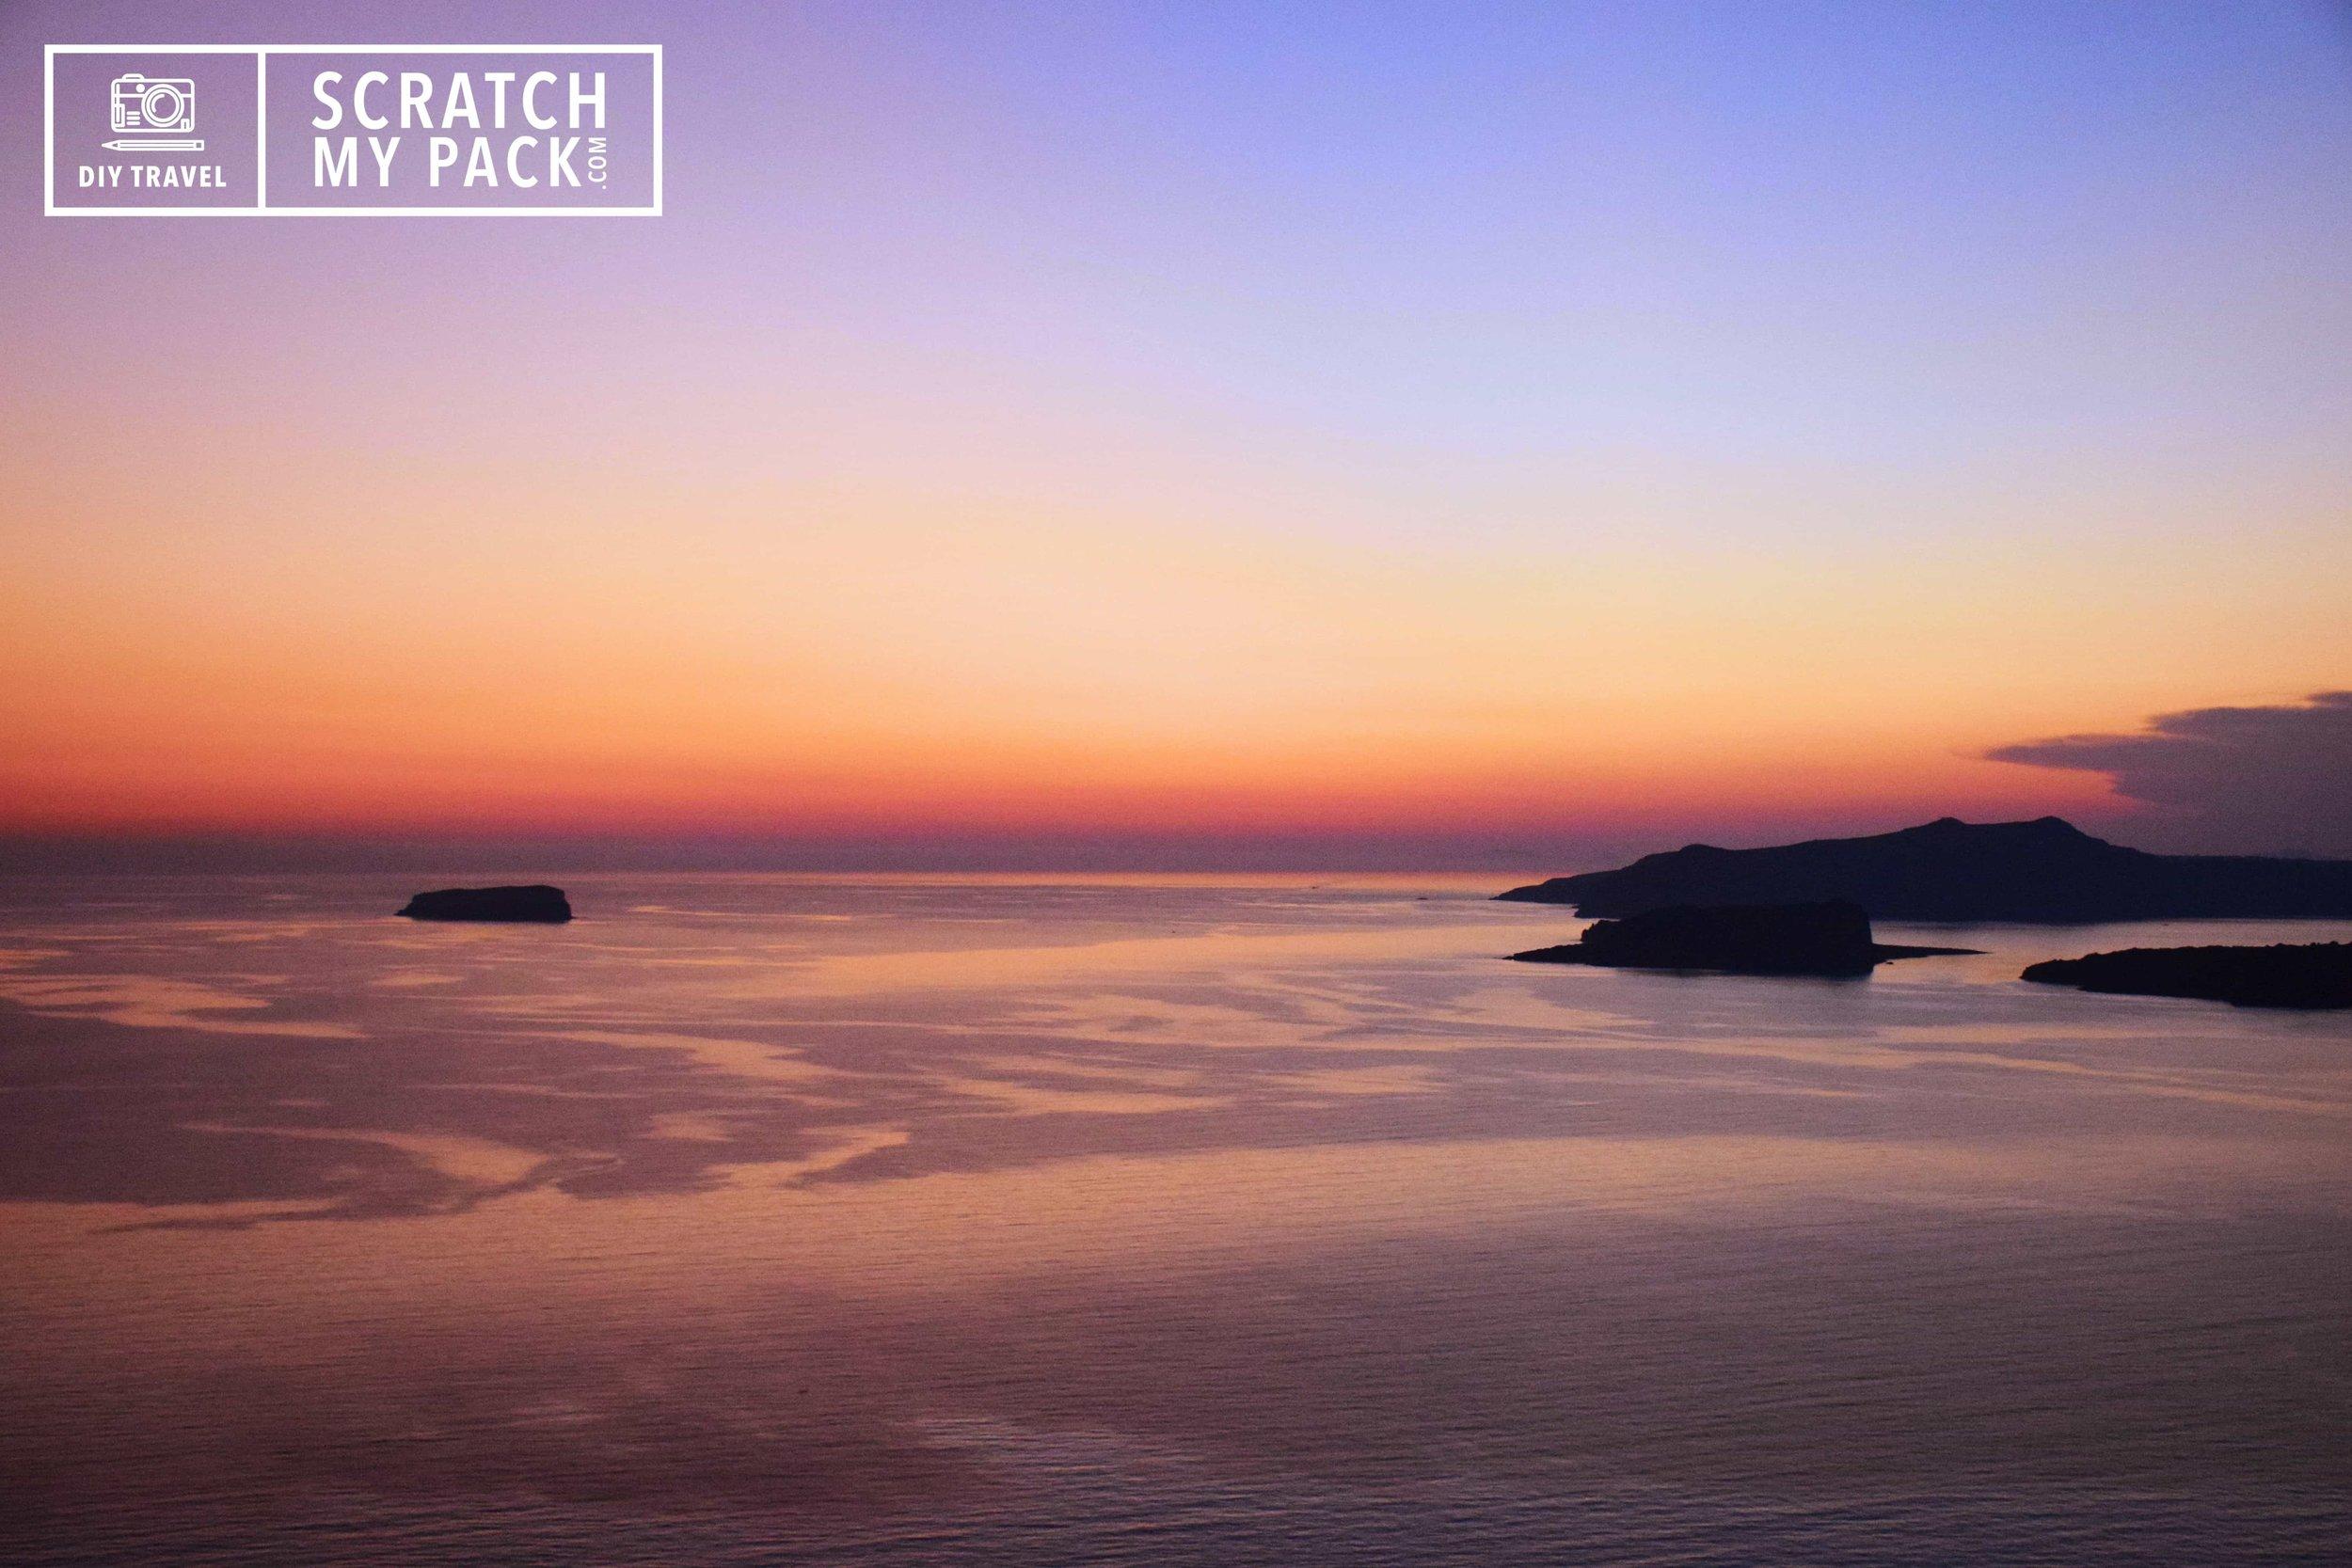 Sunset view over the caldera, Santorini